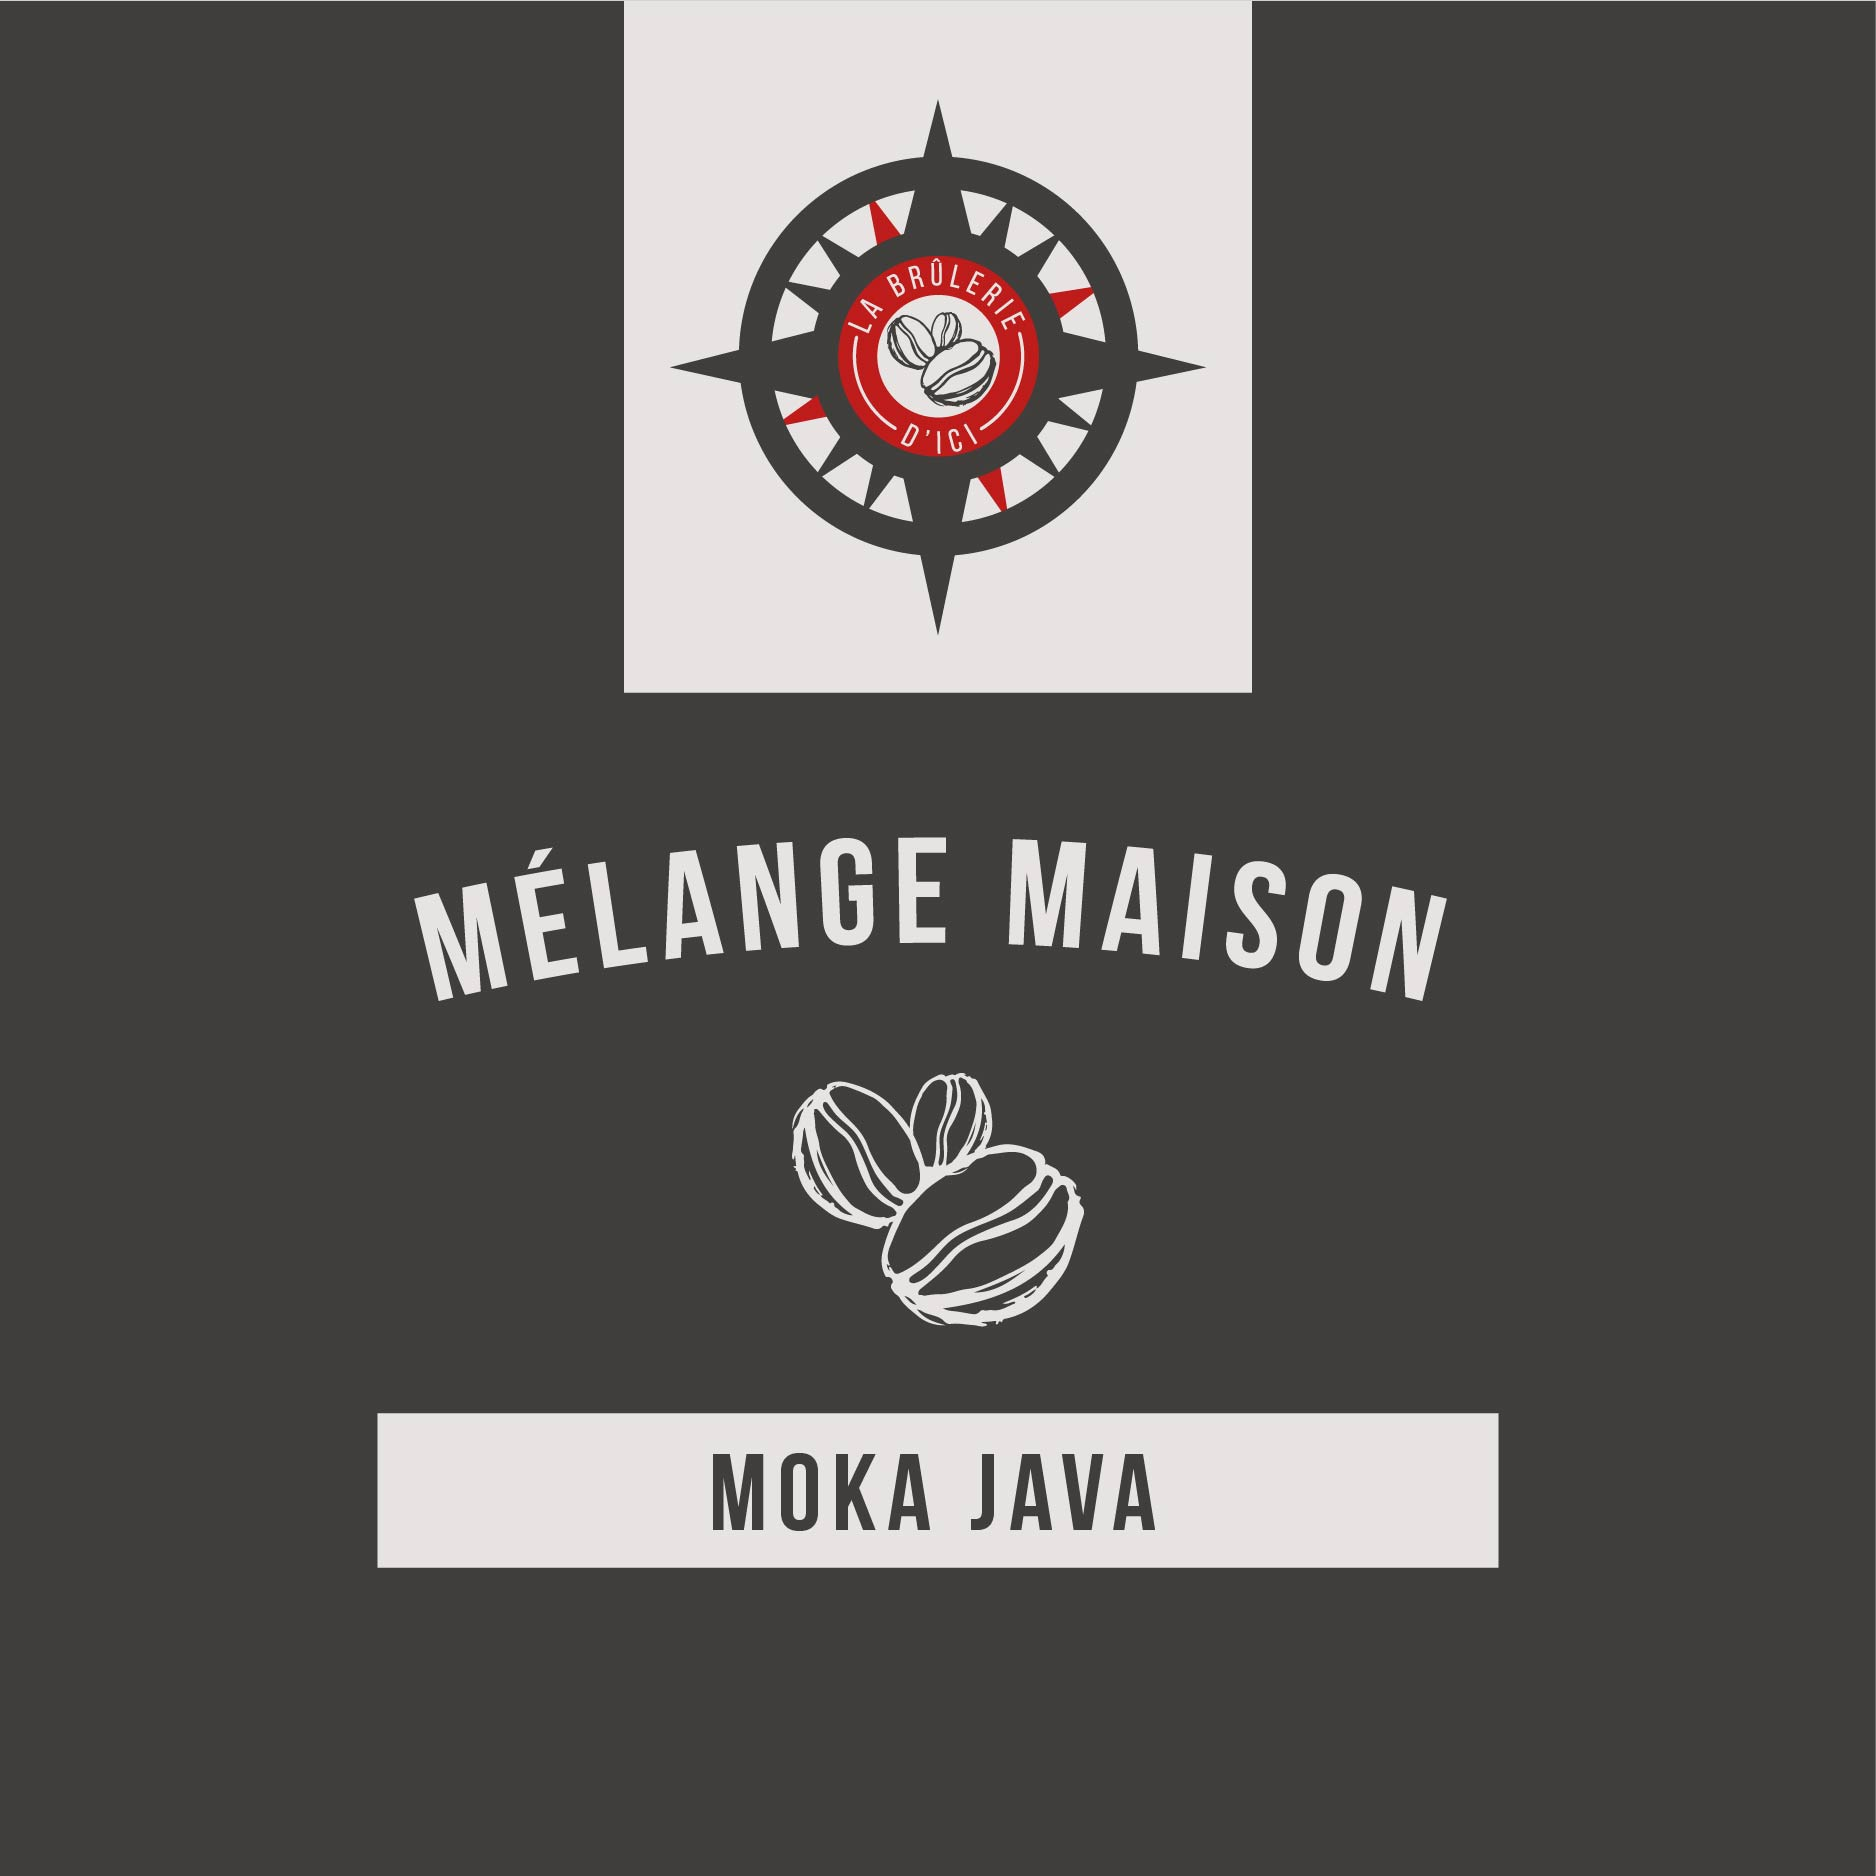 Moka Java - Mélange maison